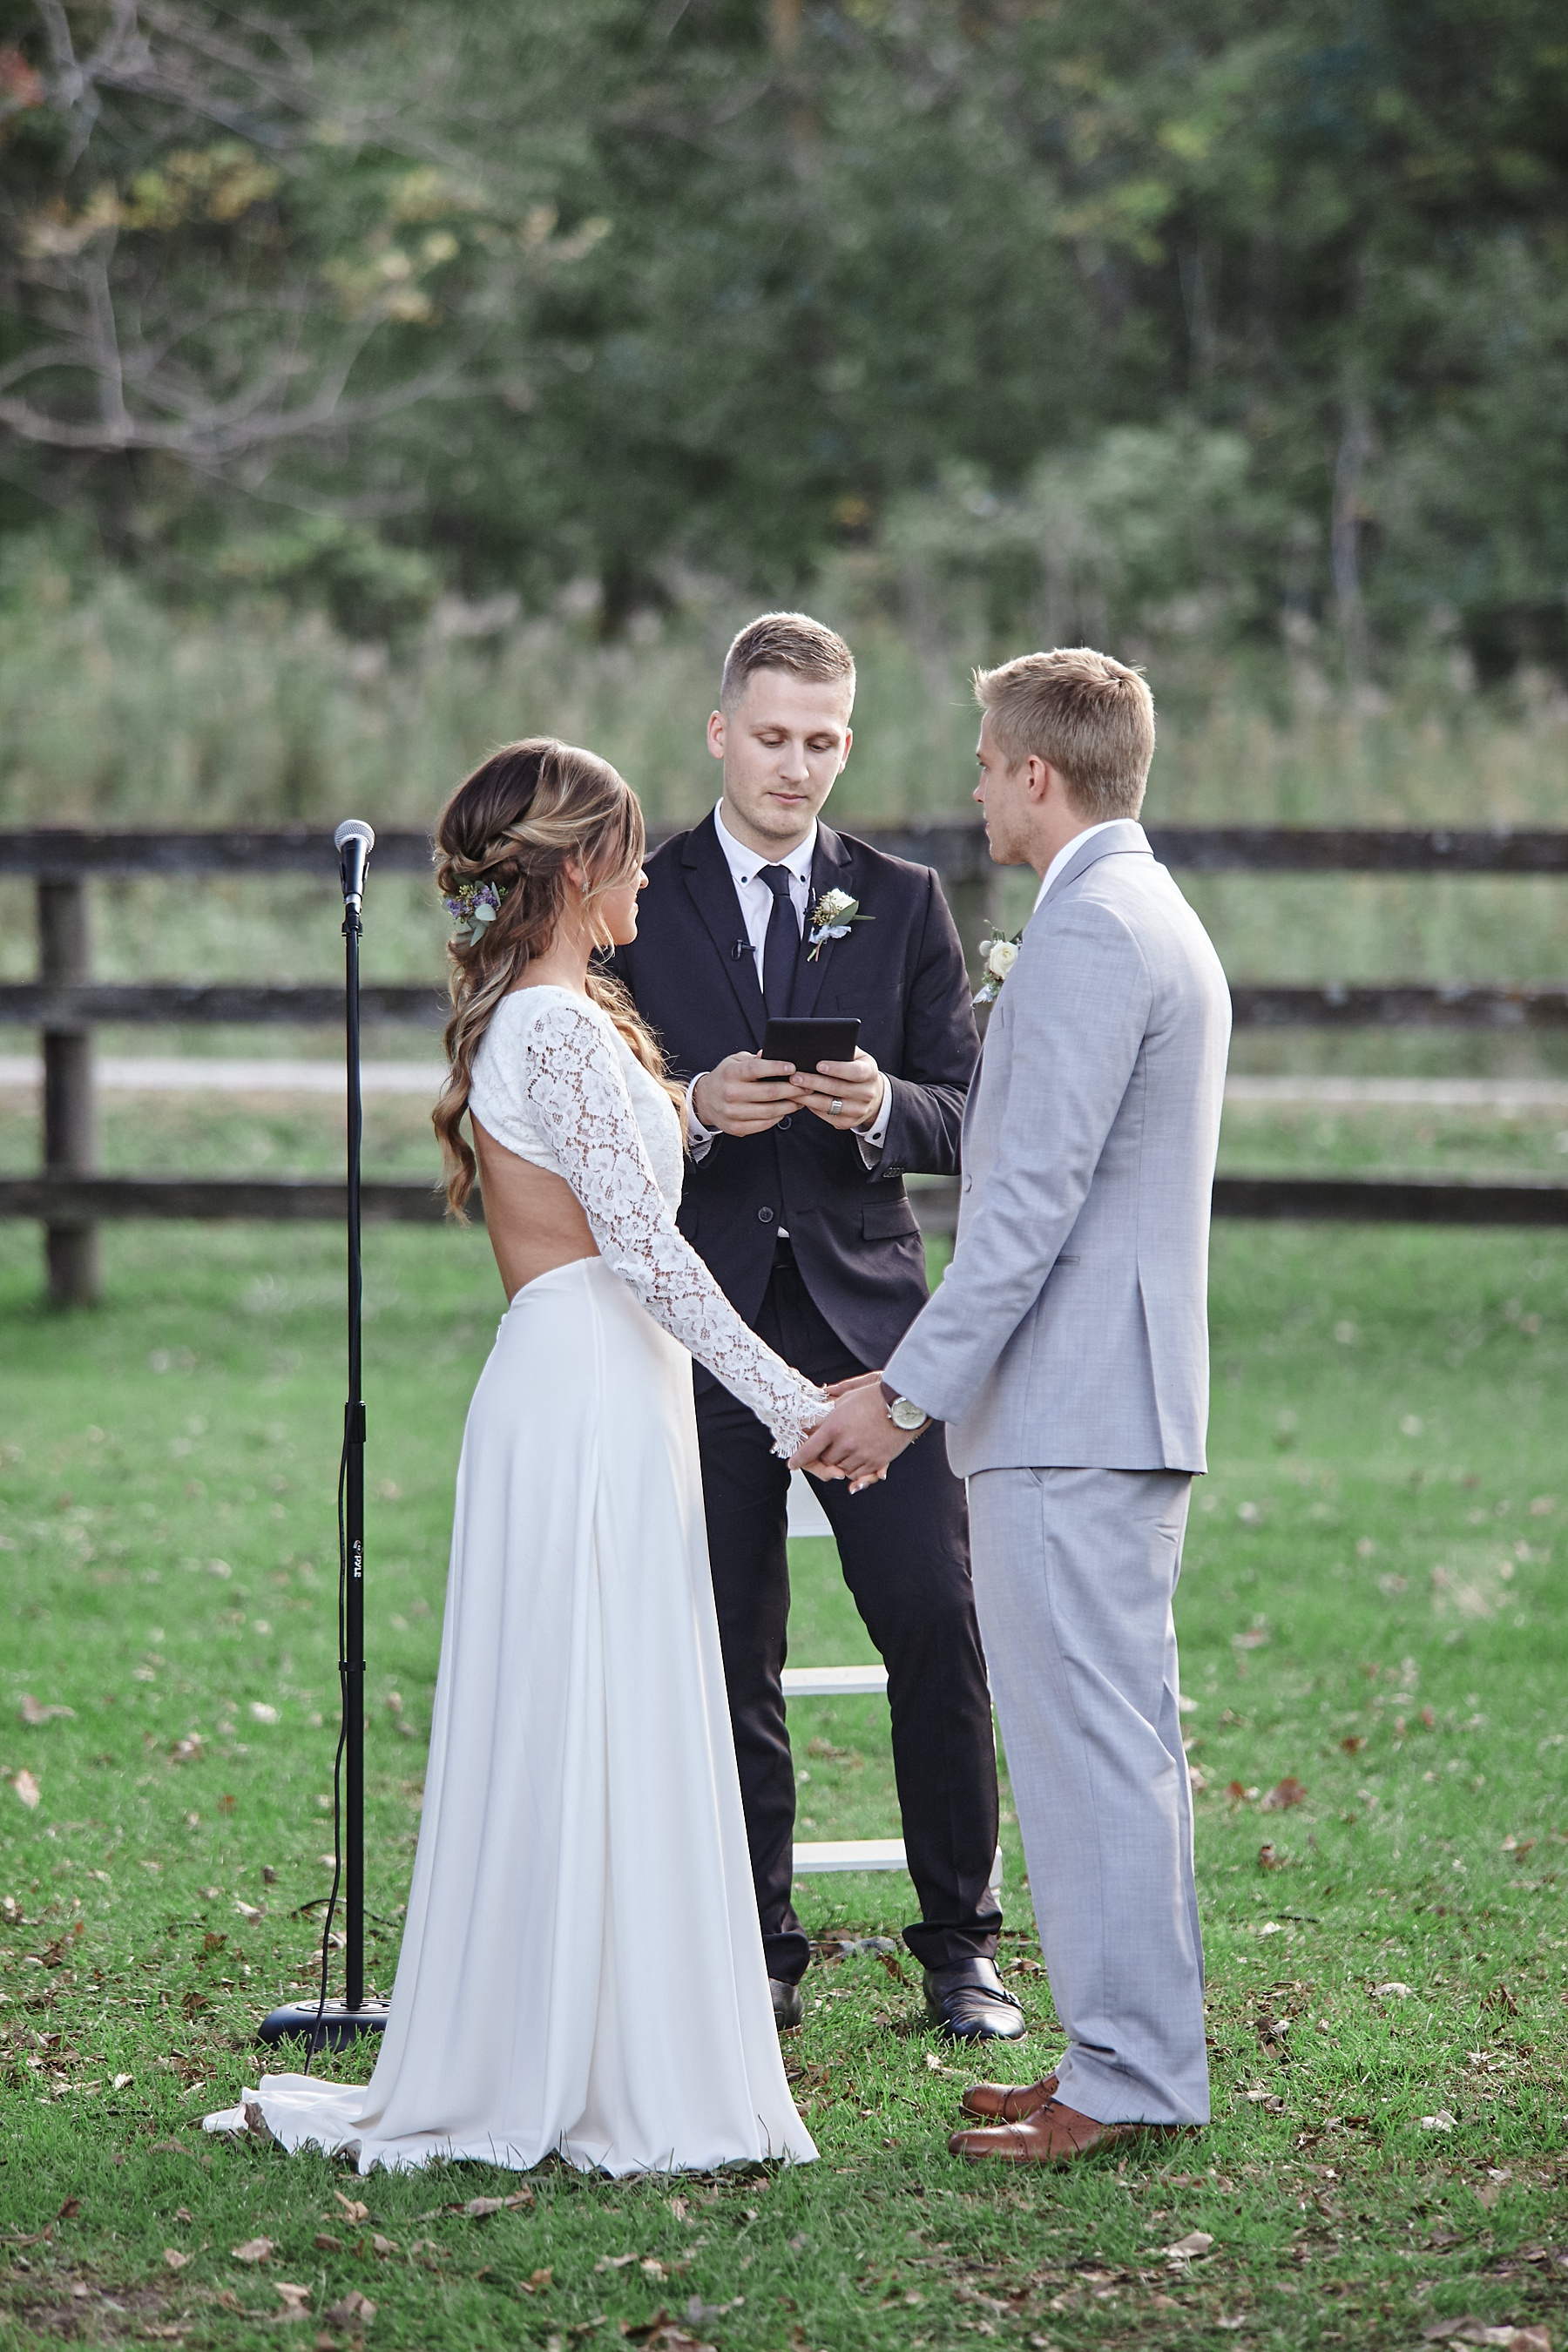 Maywood-Stone-Barn-Wedding-Rochester-Minnesota-Perry-James-Photo_0641.jpg